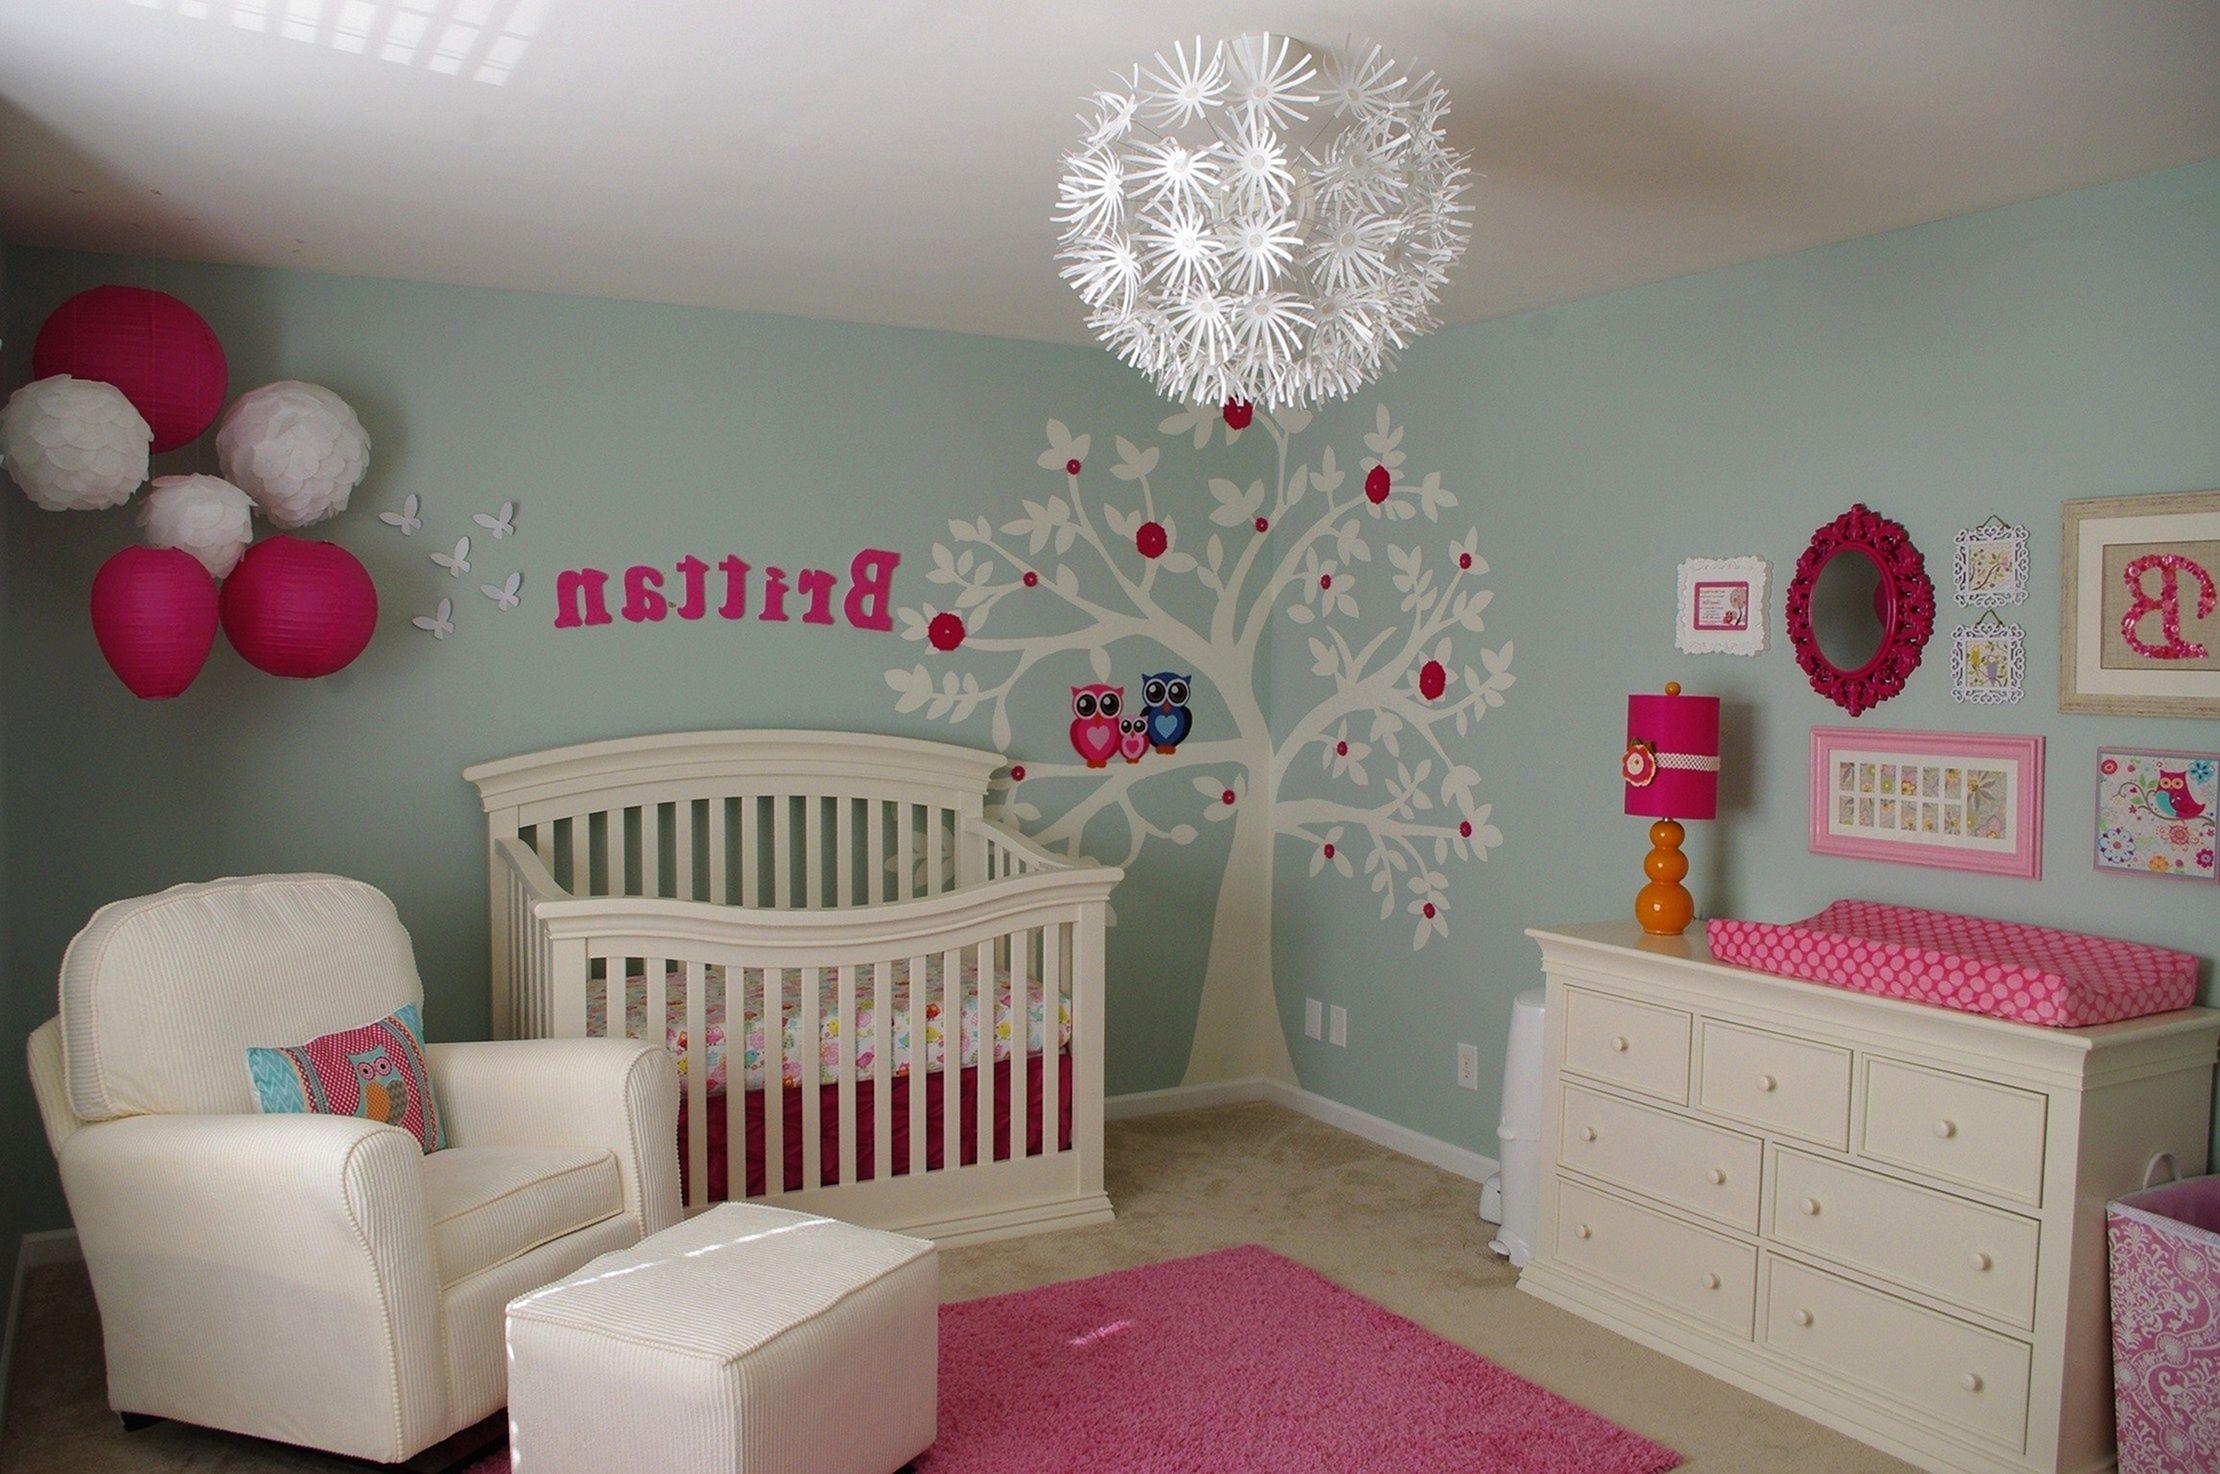 Diy Baby Room Decor Ideas For Girls Diy Baby Room Decor